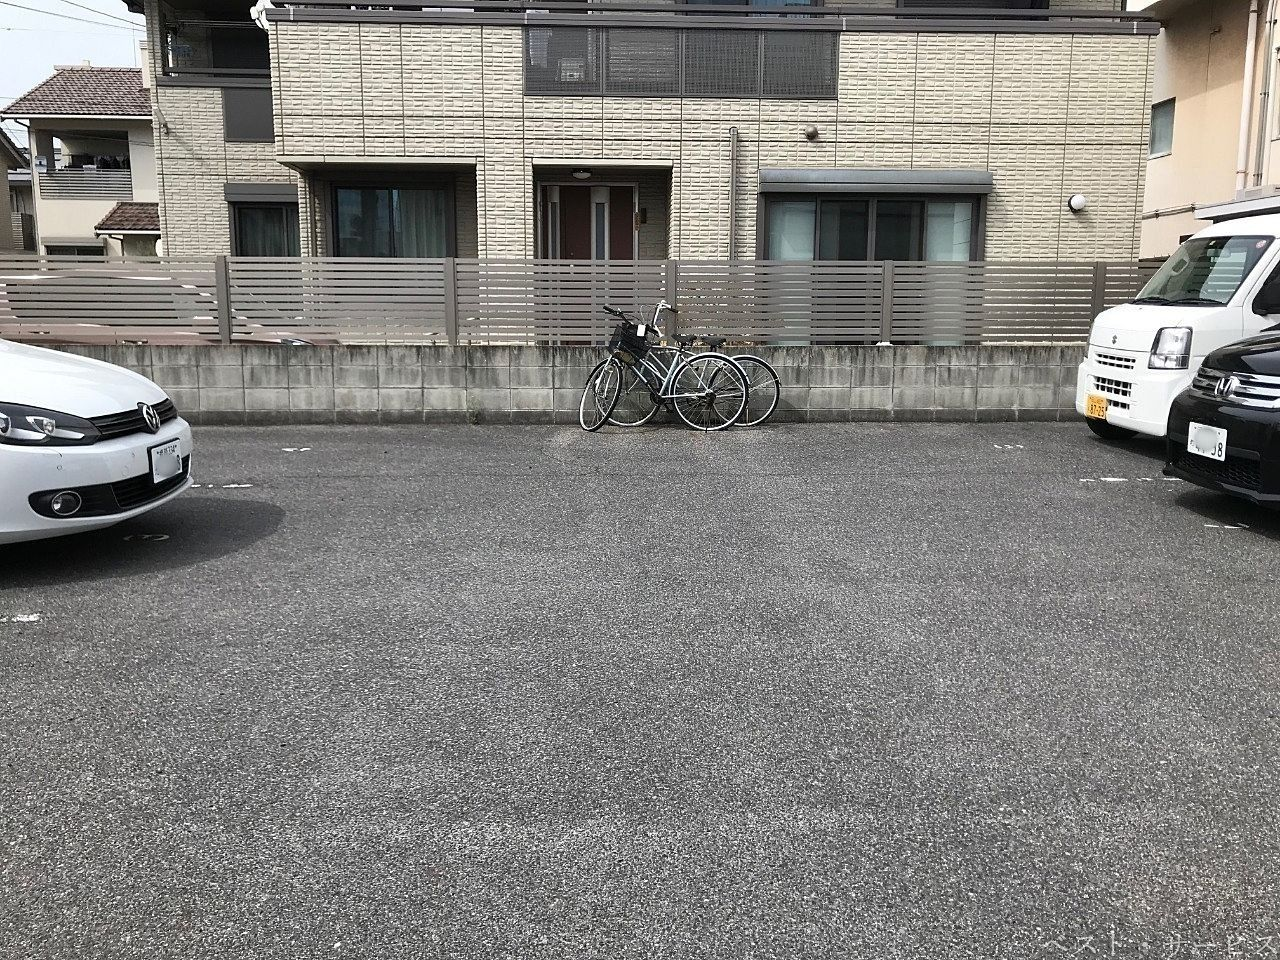 月極駐車場内の放置自転車